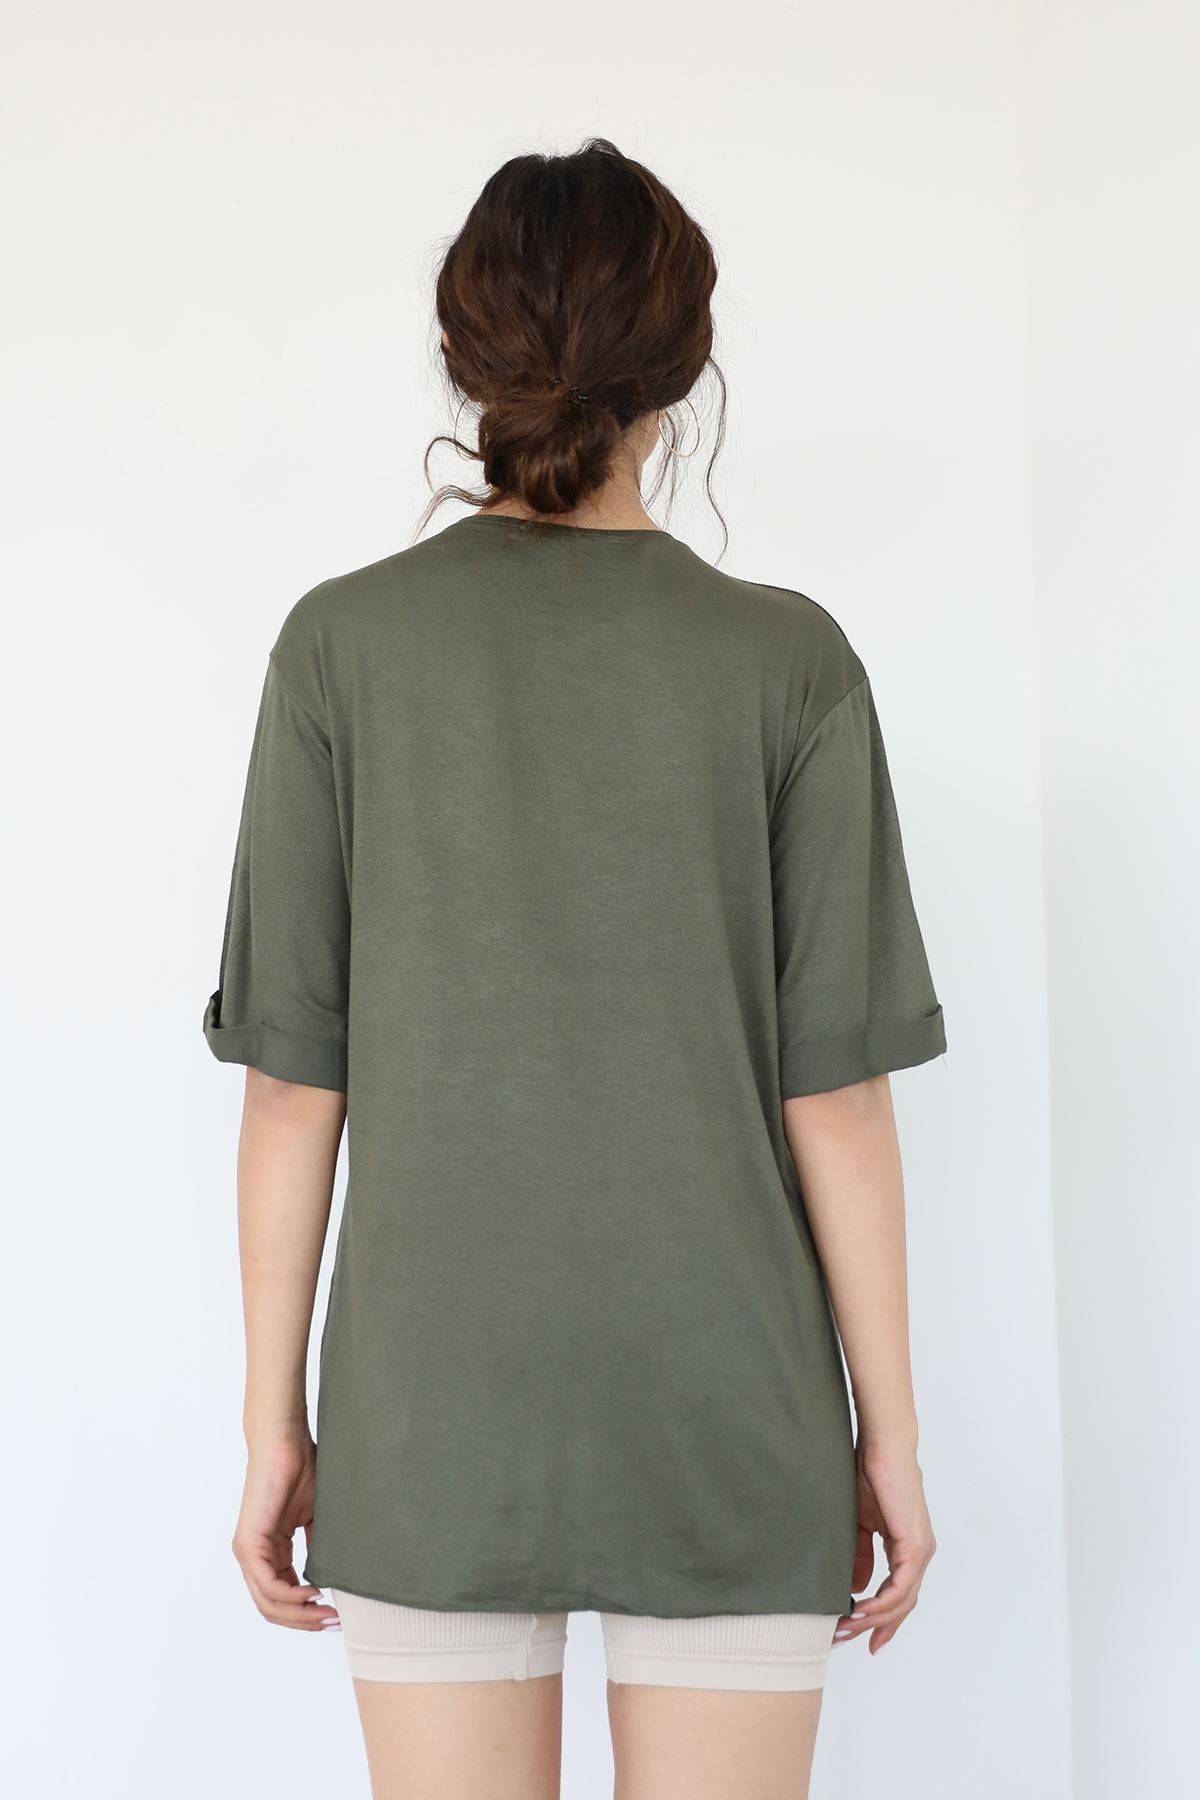 Thıngs Baskılı T-shirt-Haki